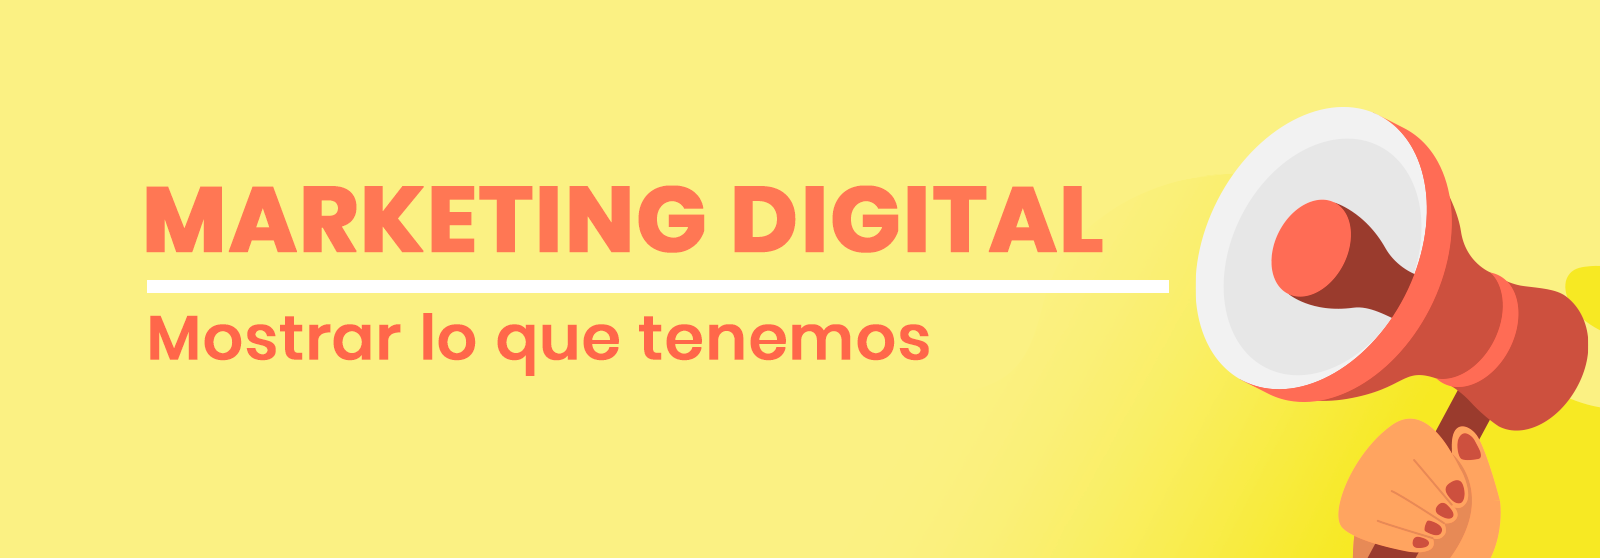 Marketing Digital E-commerce